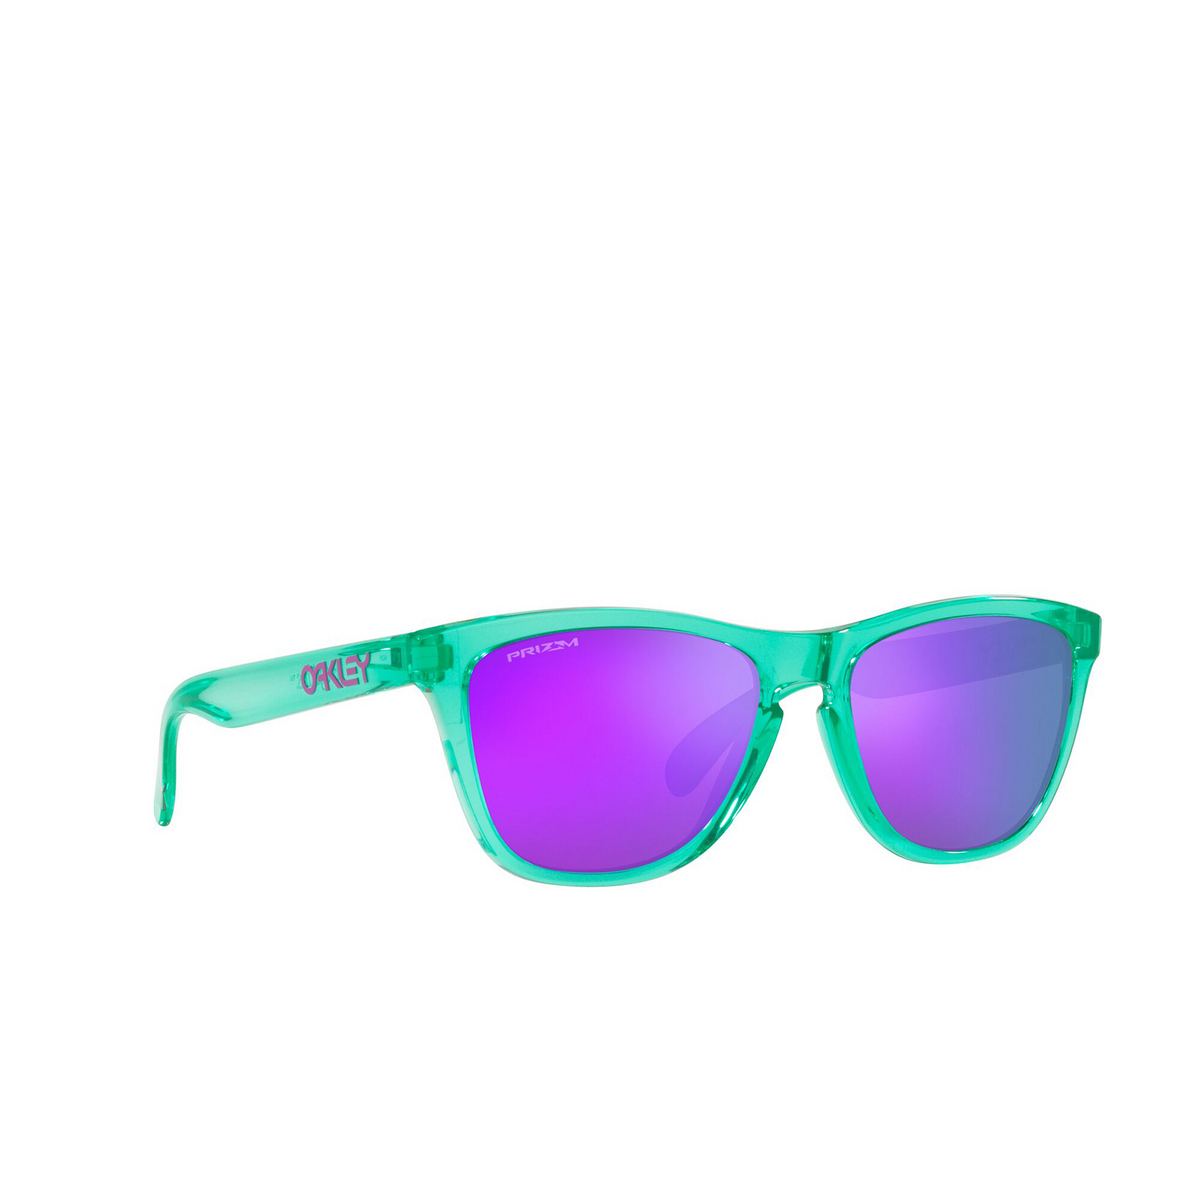 Oakley® Square Sunglasses: Frogskins OO9013 color Translucent Celeste 9013J8 - three-quarters view.